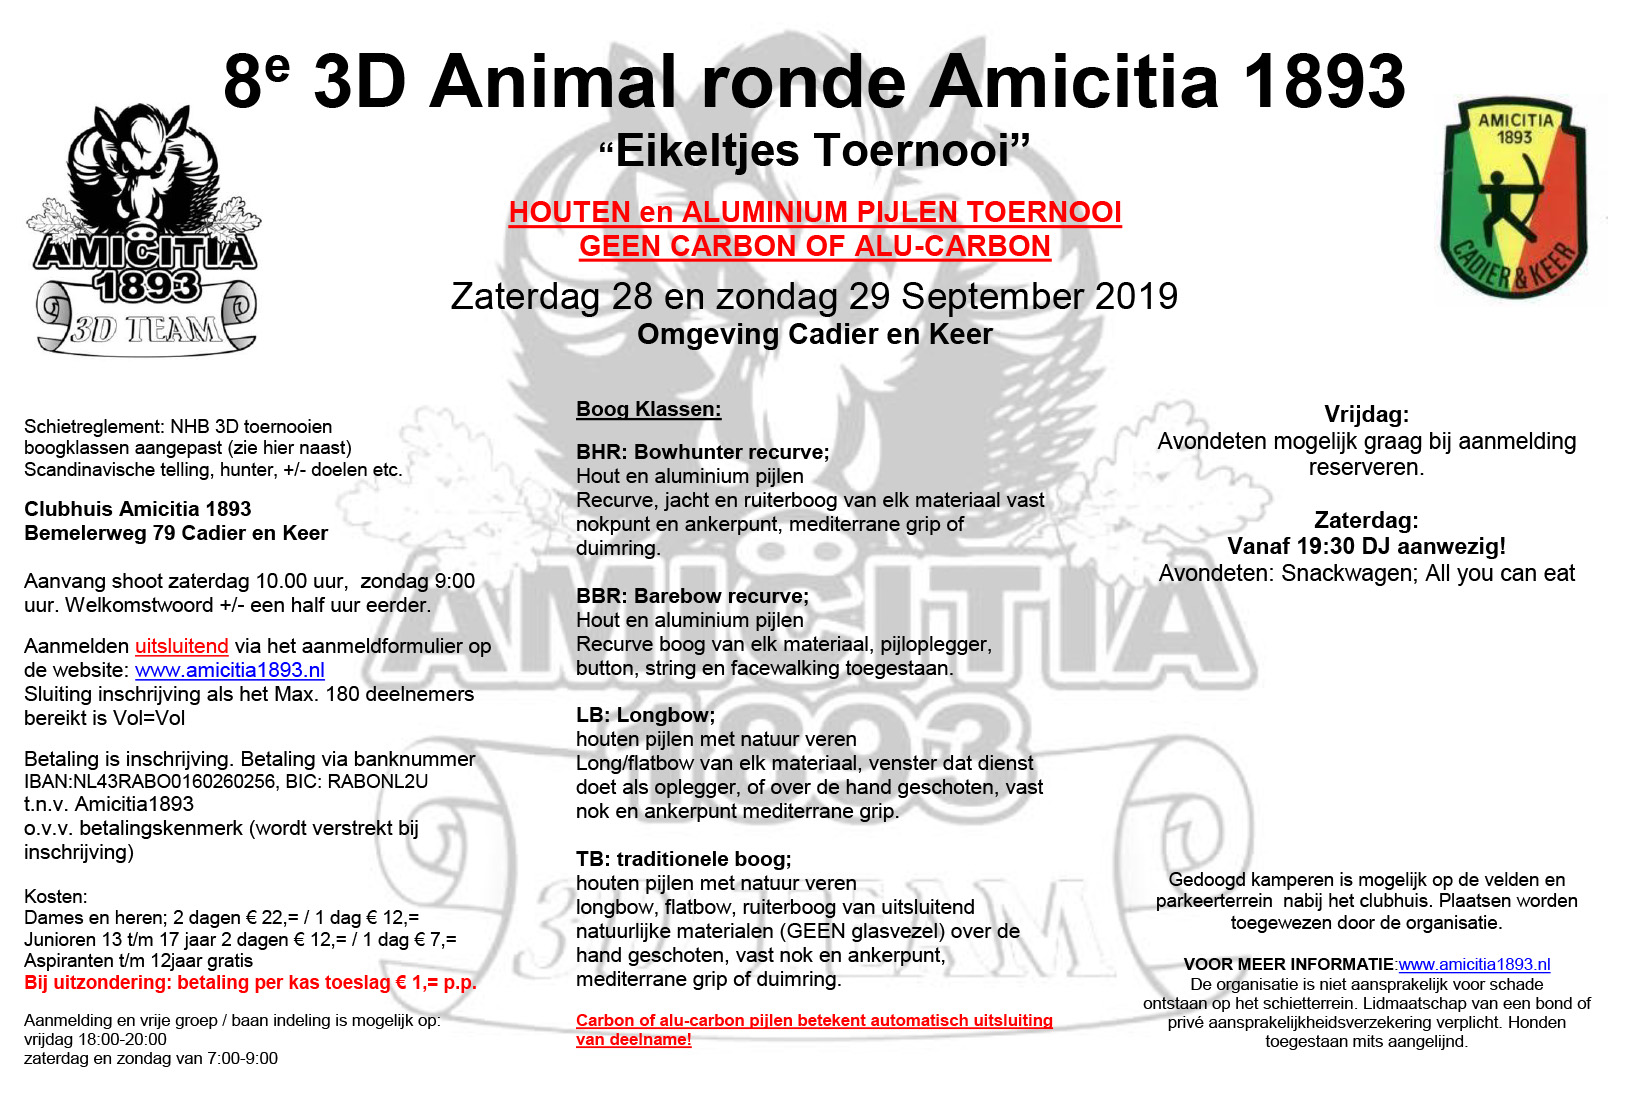 1ste 3D Animal ronde Amicitia 1893